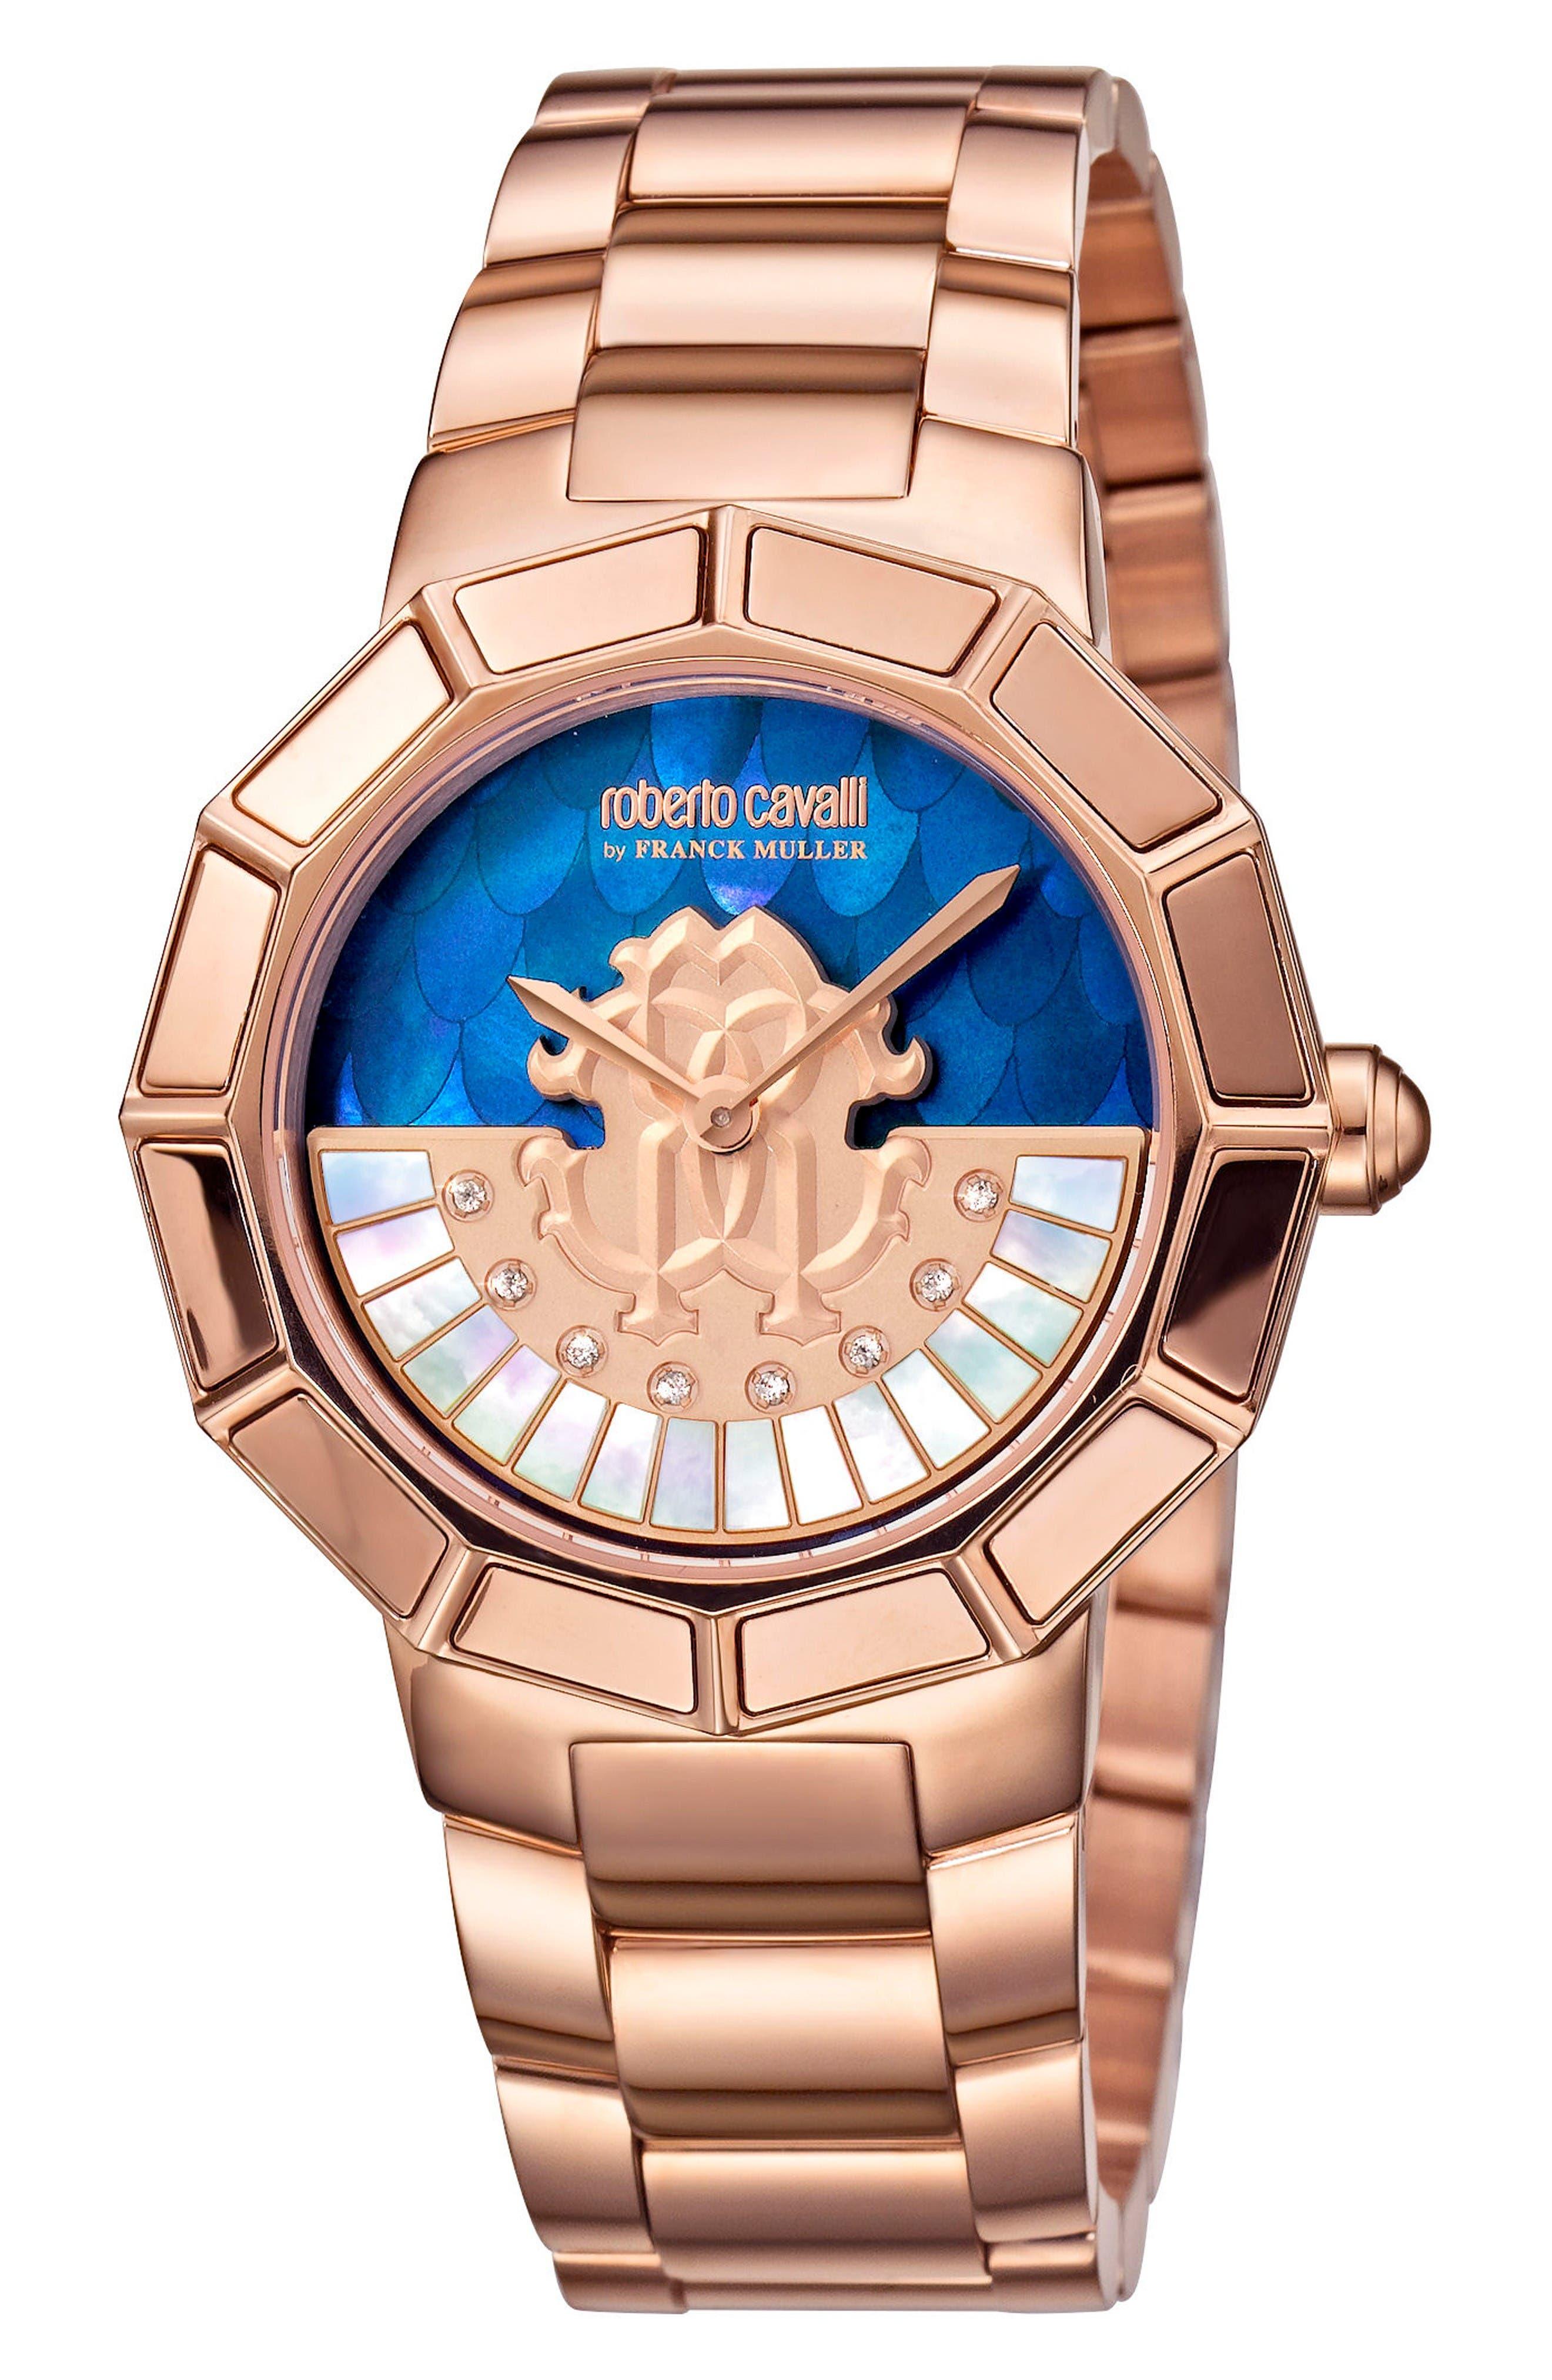 Main Image - Roberto Cavalli by Franck Muller Rotating Dial Bracelet Watch, 37mm